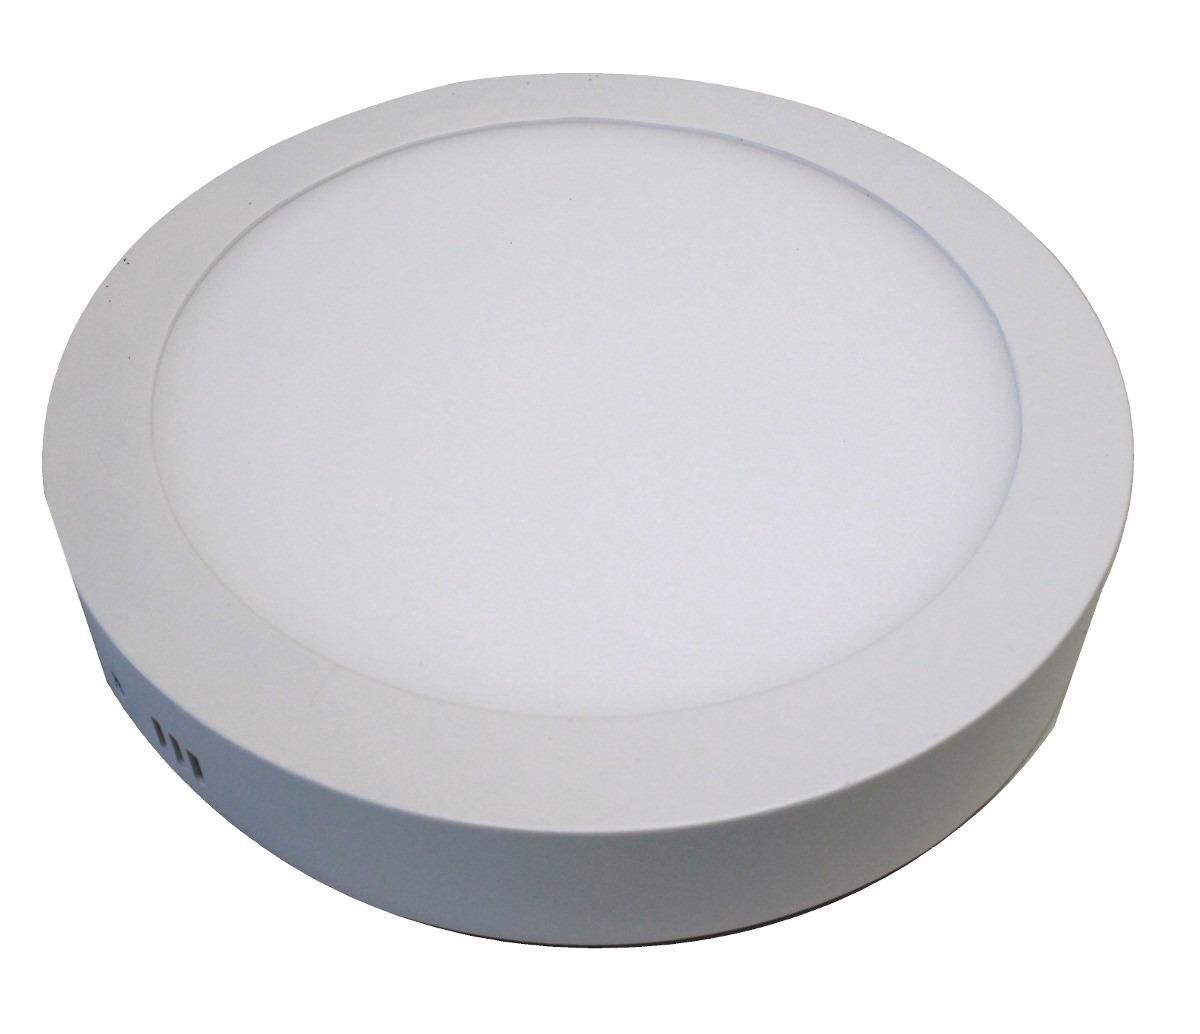 Painel Plafon Redondo Luminária Sobrepor Led 18w Bivolt Branco Frio - RPC-COMMERCE